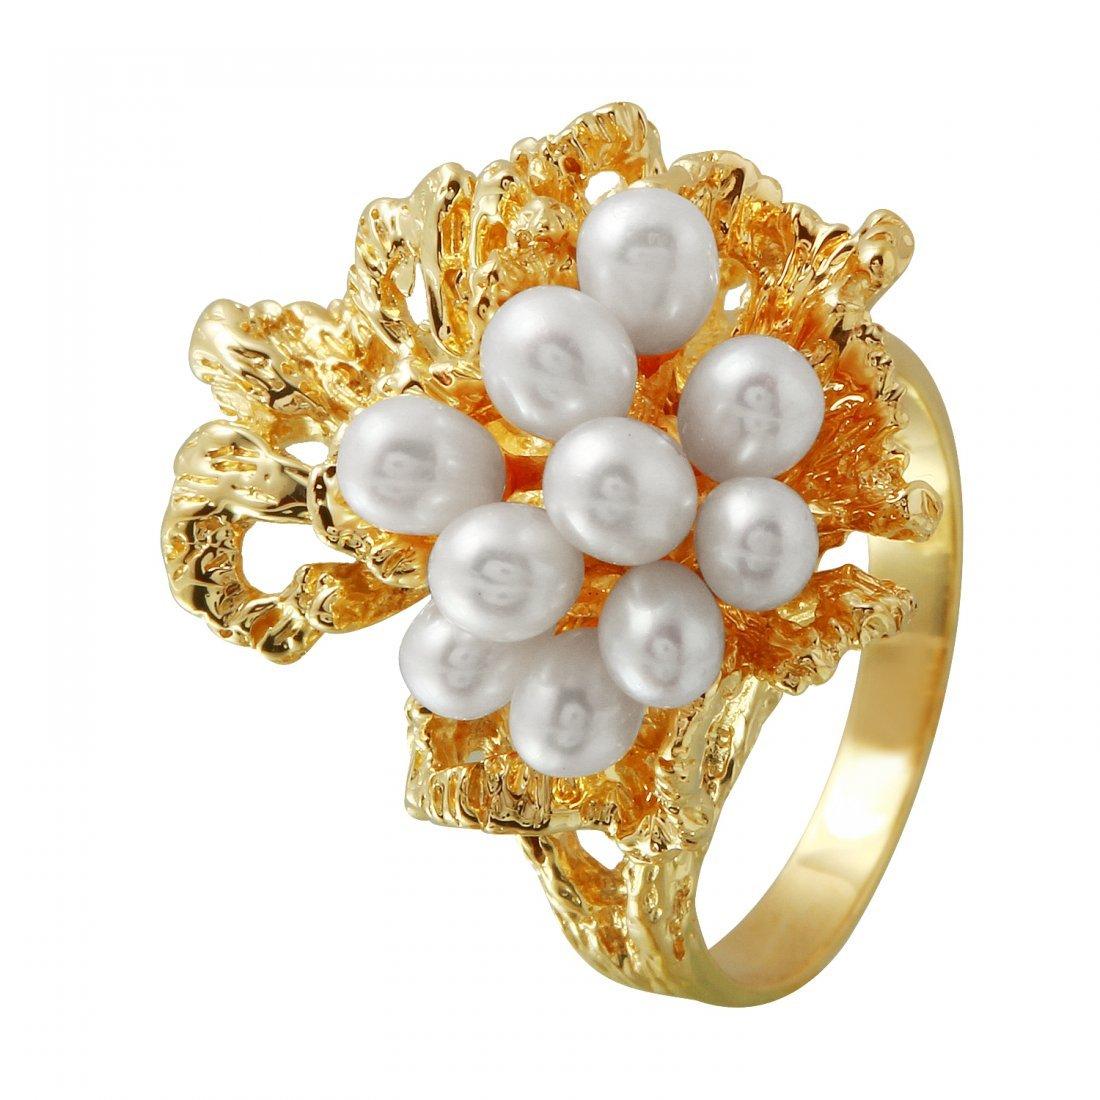 Ladies 3-4MM Freshwater Pearl 14K Yellow Gold Ring